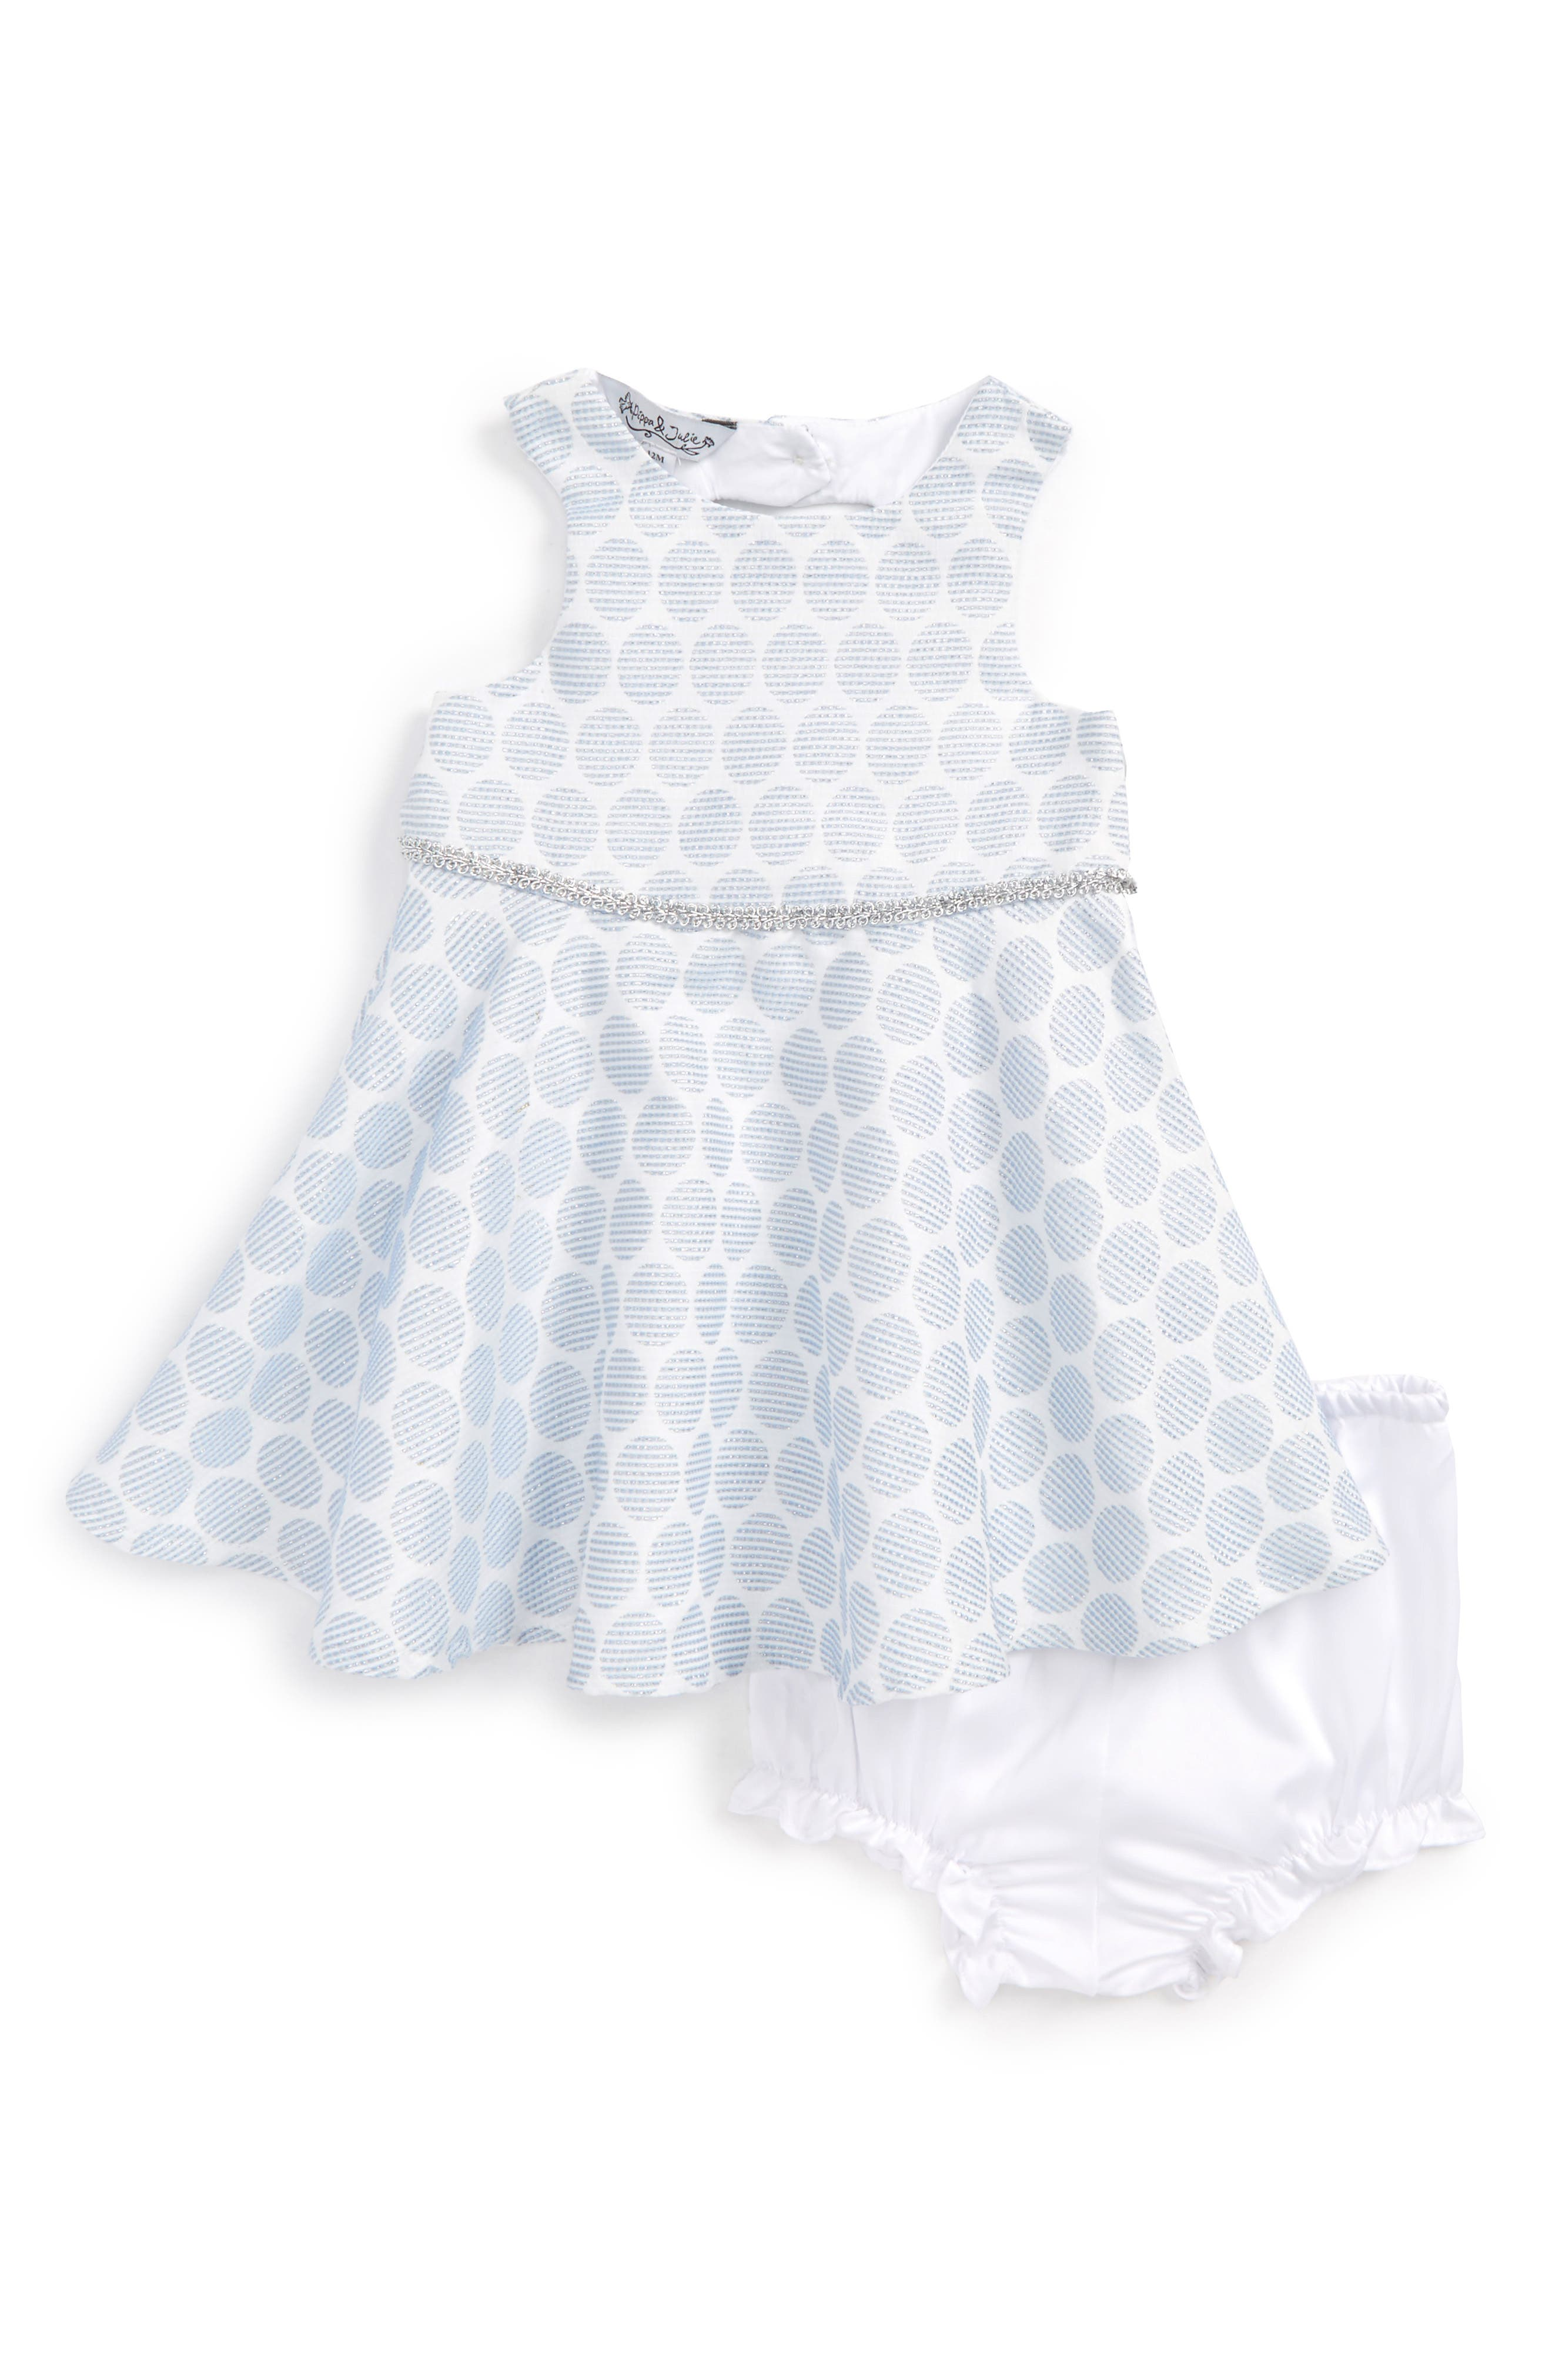 Alternate Image 1 Selected - Pippa & Julie Polka Dot Dress (Baby Girls)